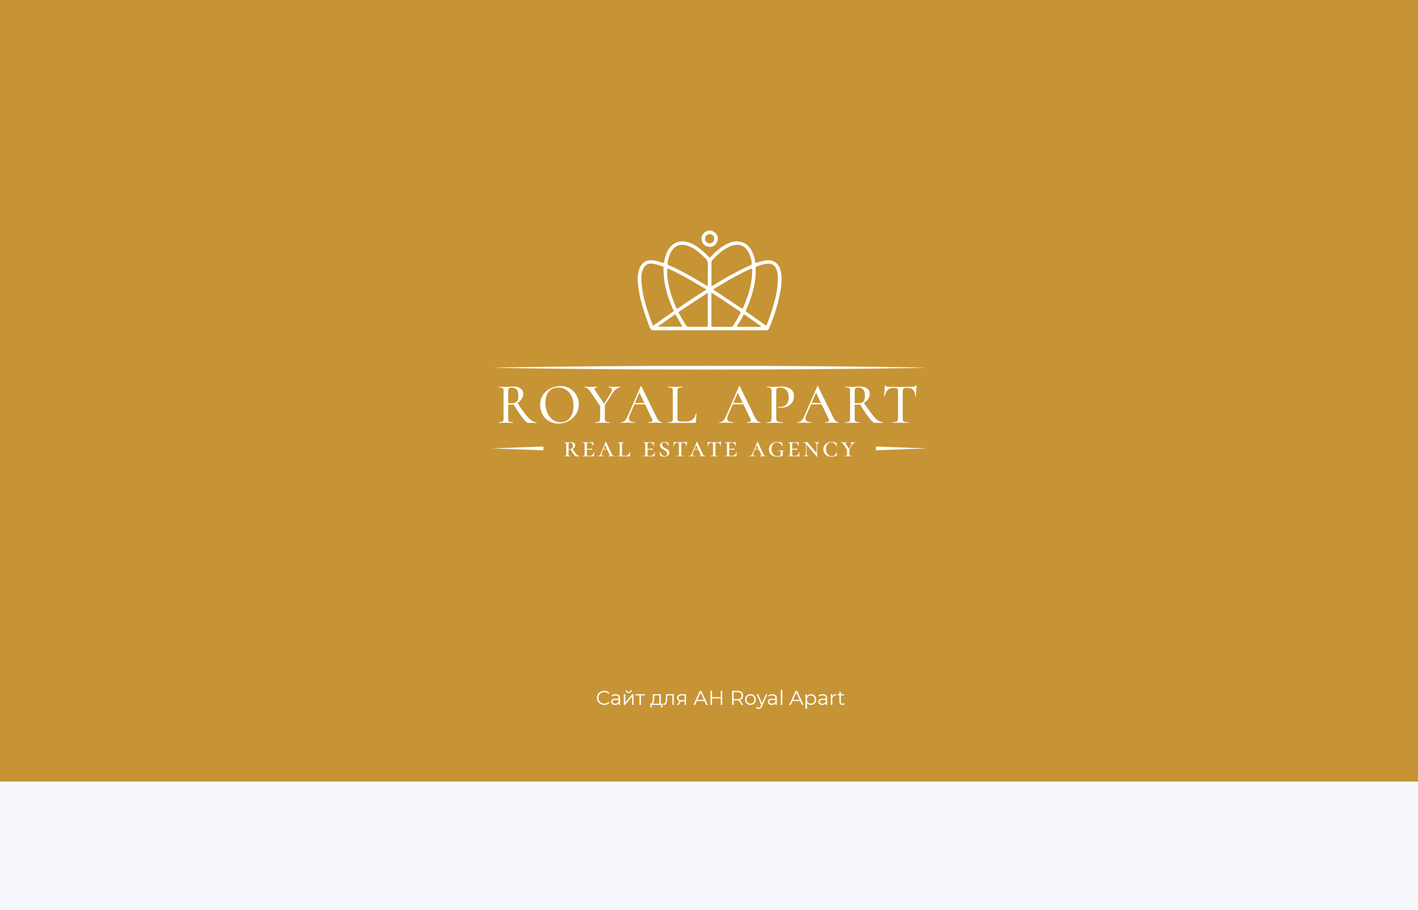 Royal Apart